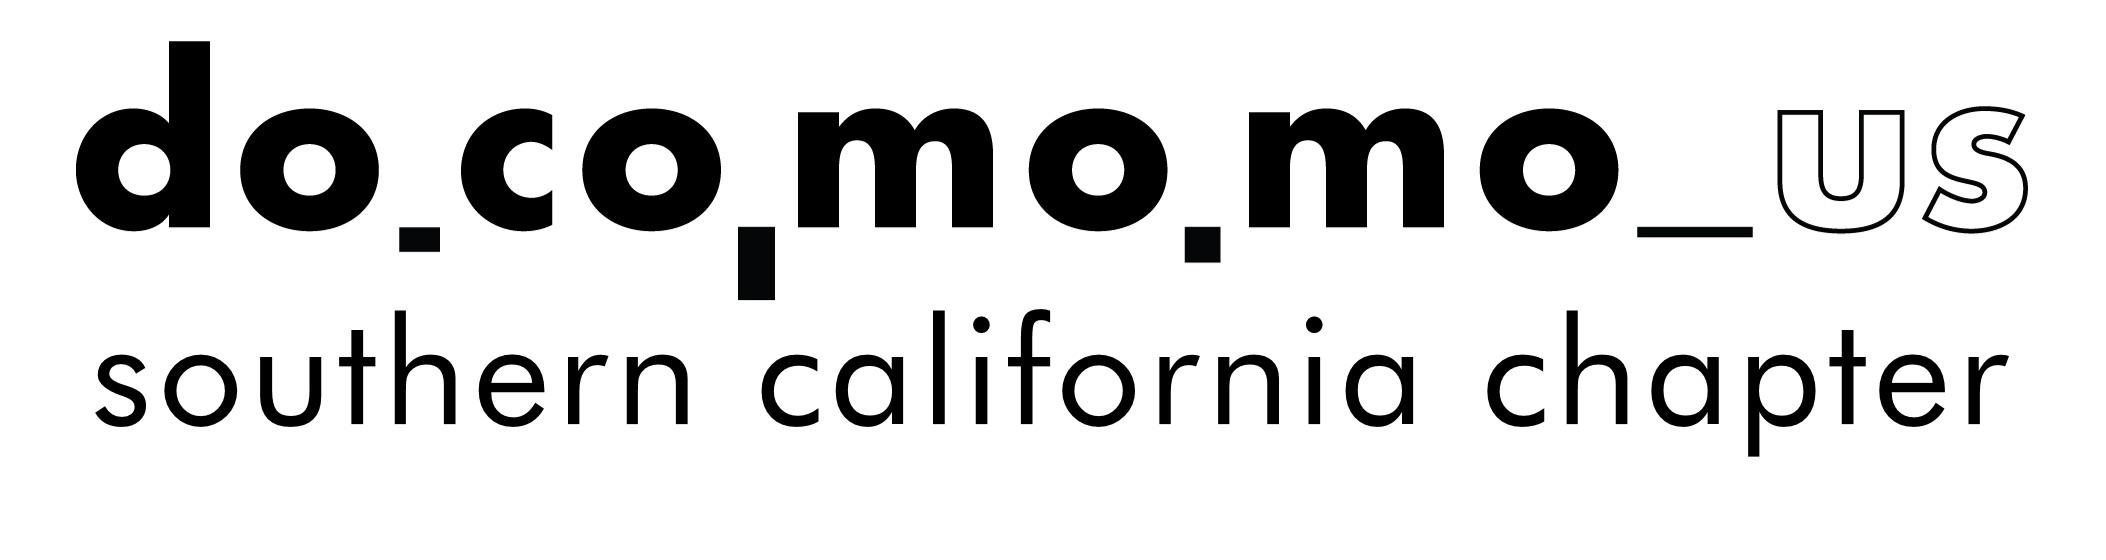 Doco logo.jpg